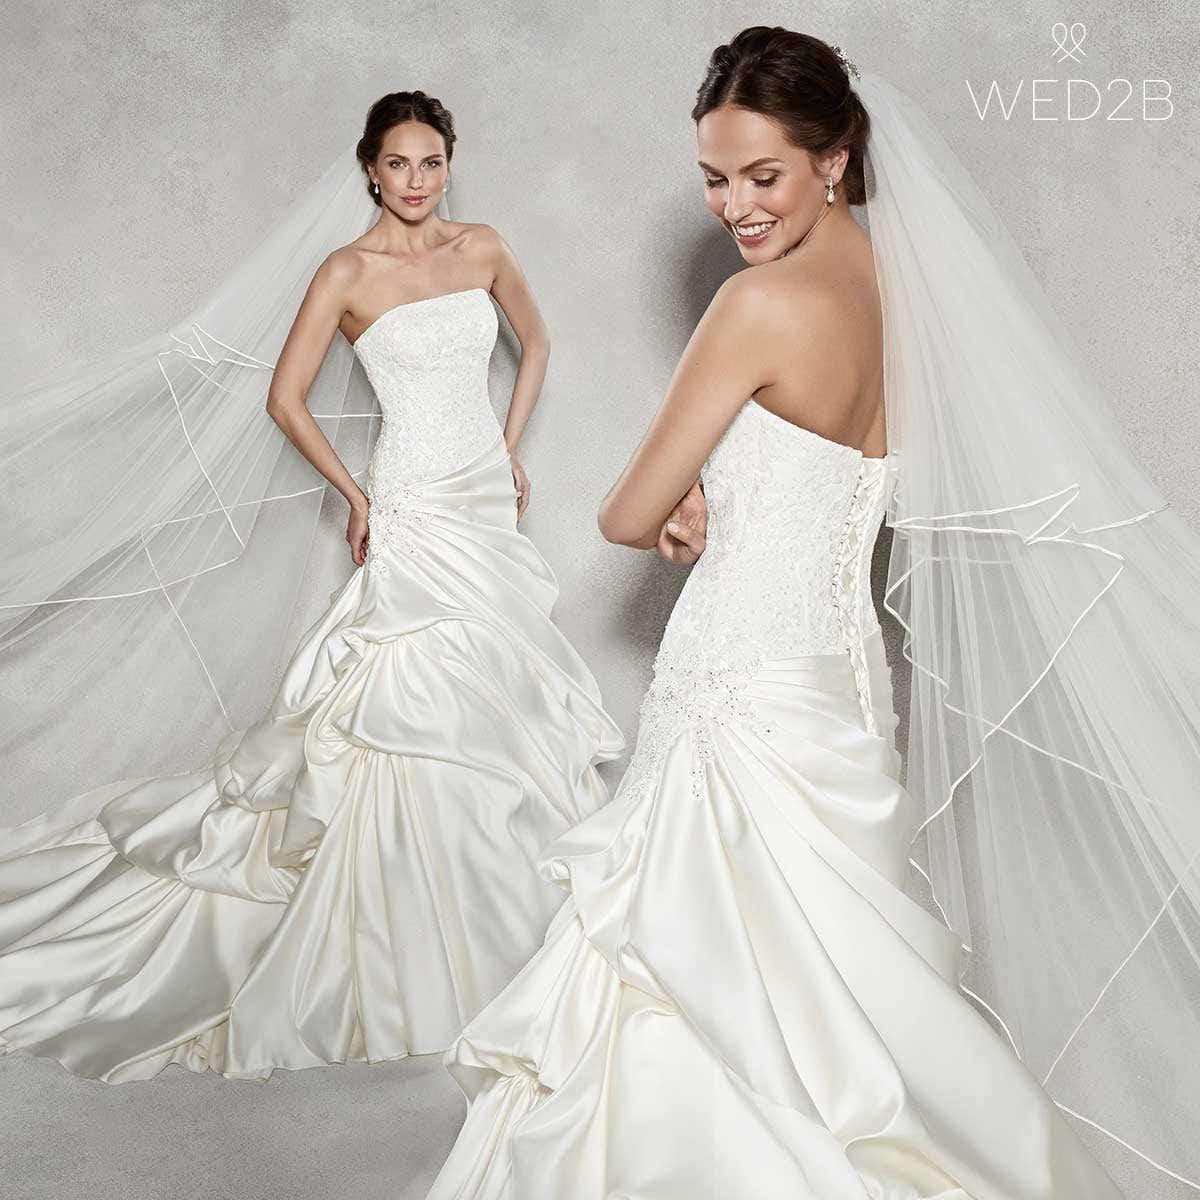 Renata stunning fit and flare wedding dress